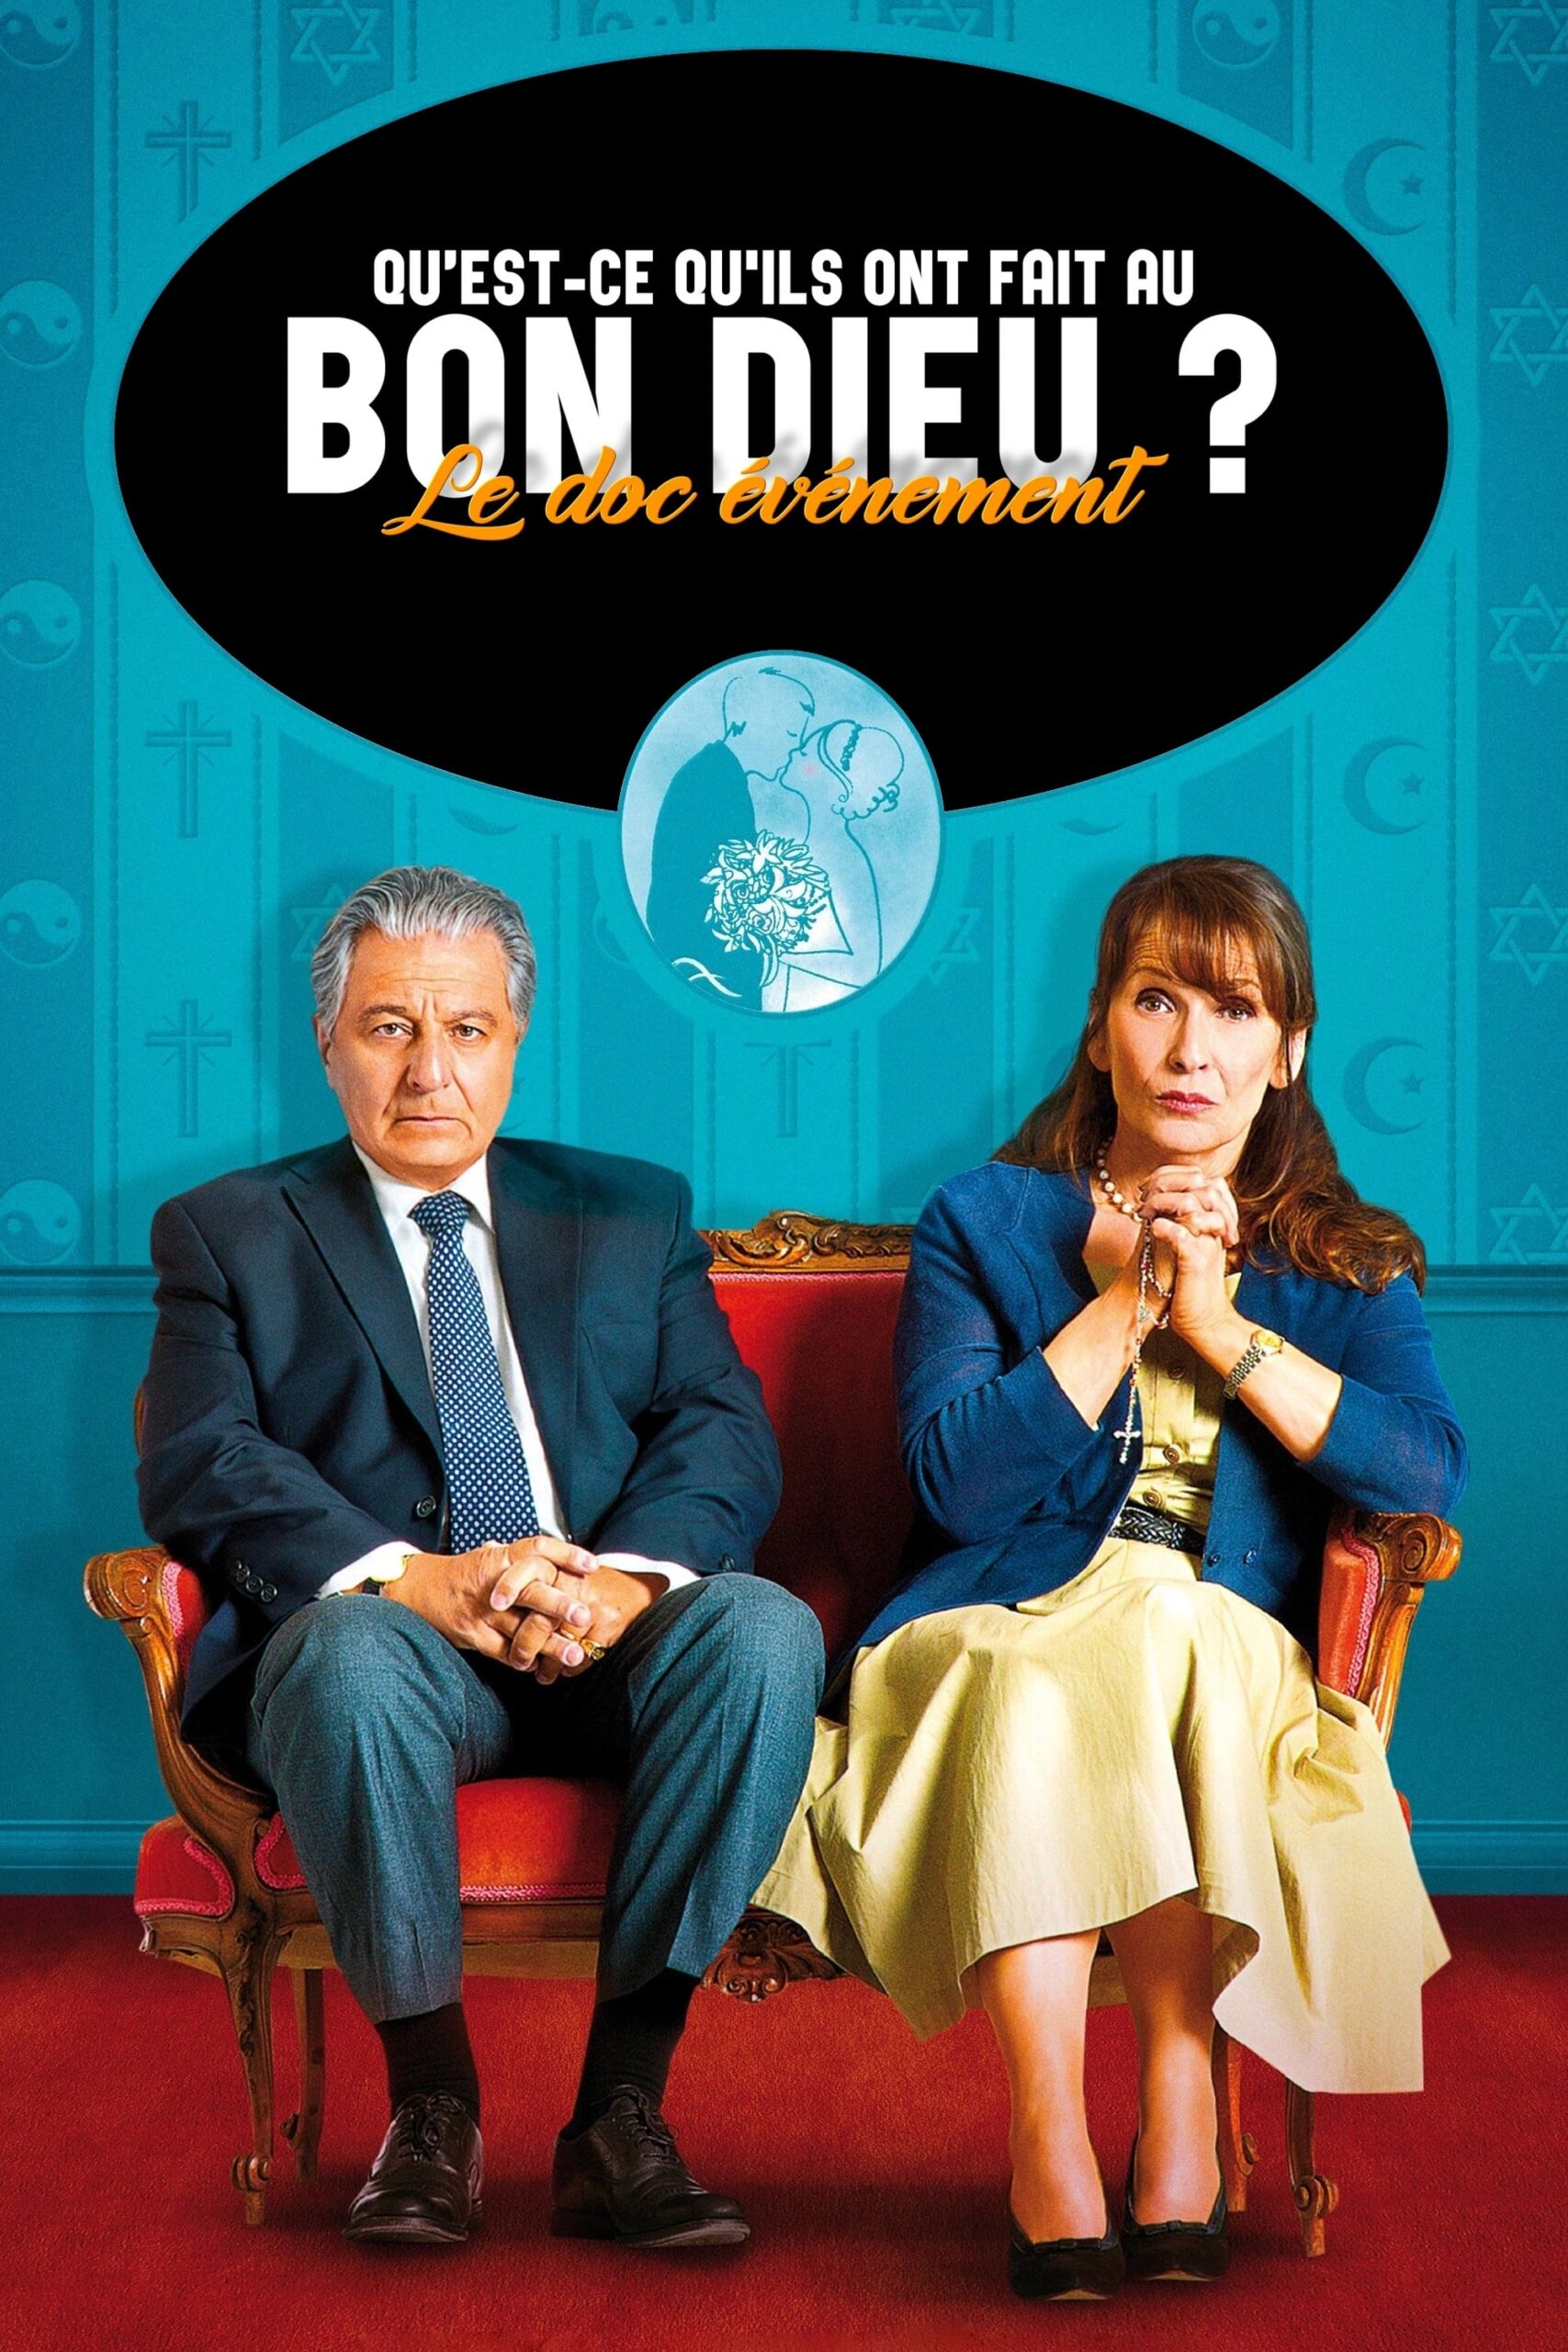 Qu'est Ce Qu'on A Fait Au Bon Dieu Streaming : qu'est, qu'on, streaming, Qu'est-ce, Qu'ils, Dieu?, French, Movie, Streaming, Online, Watch